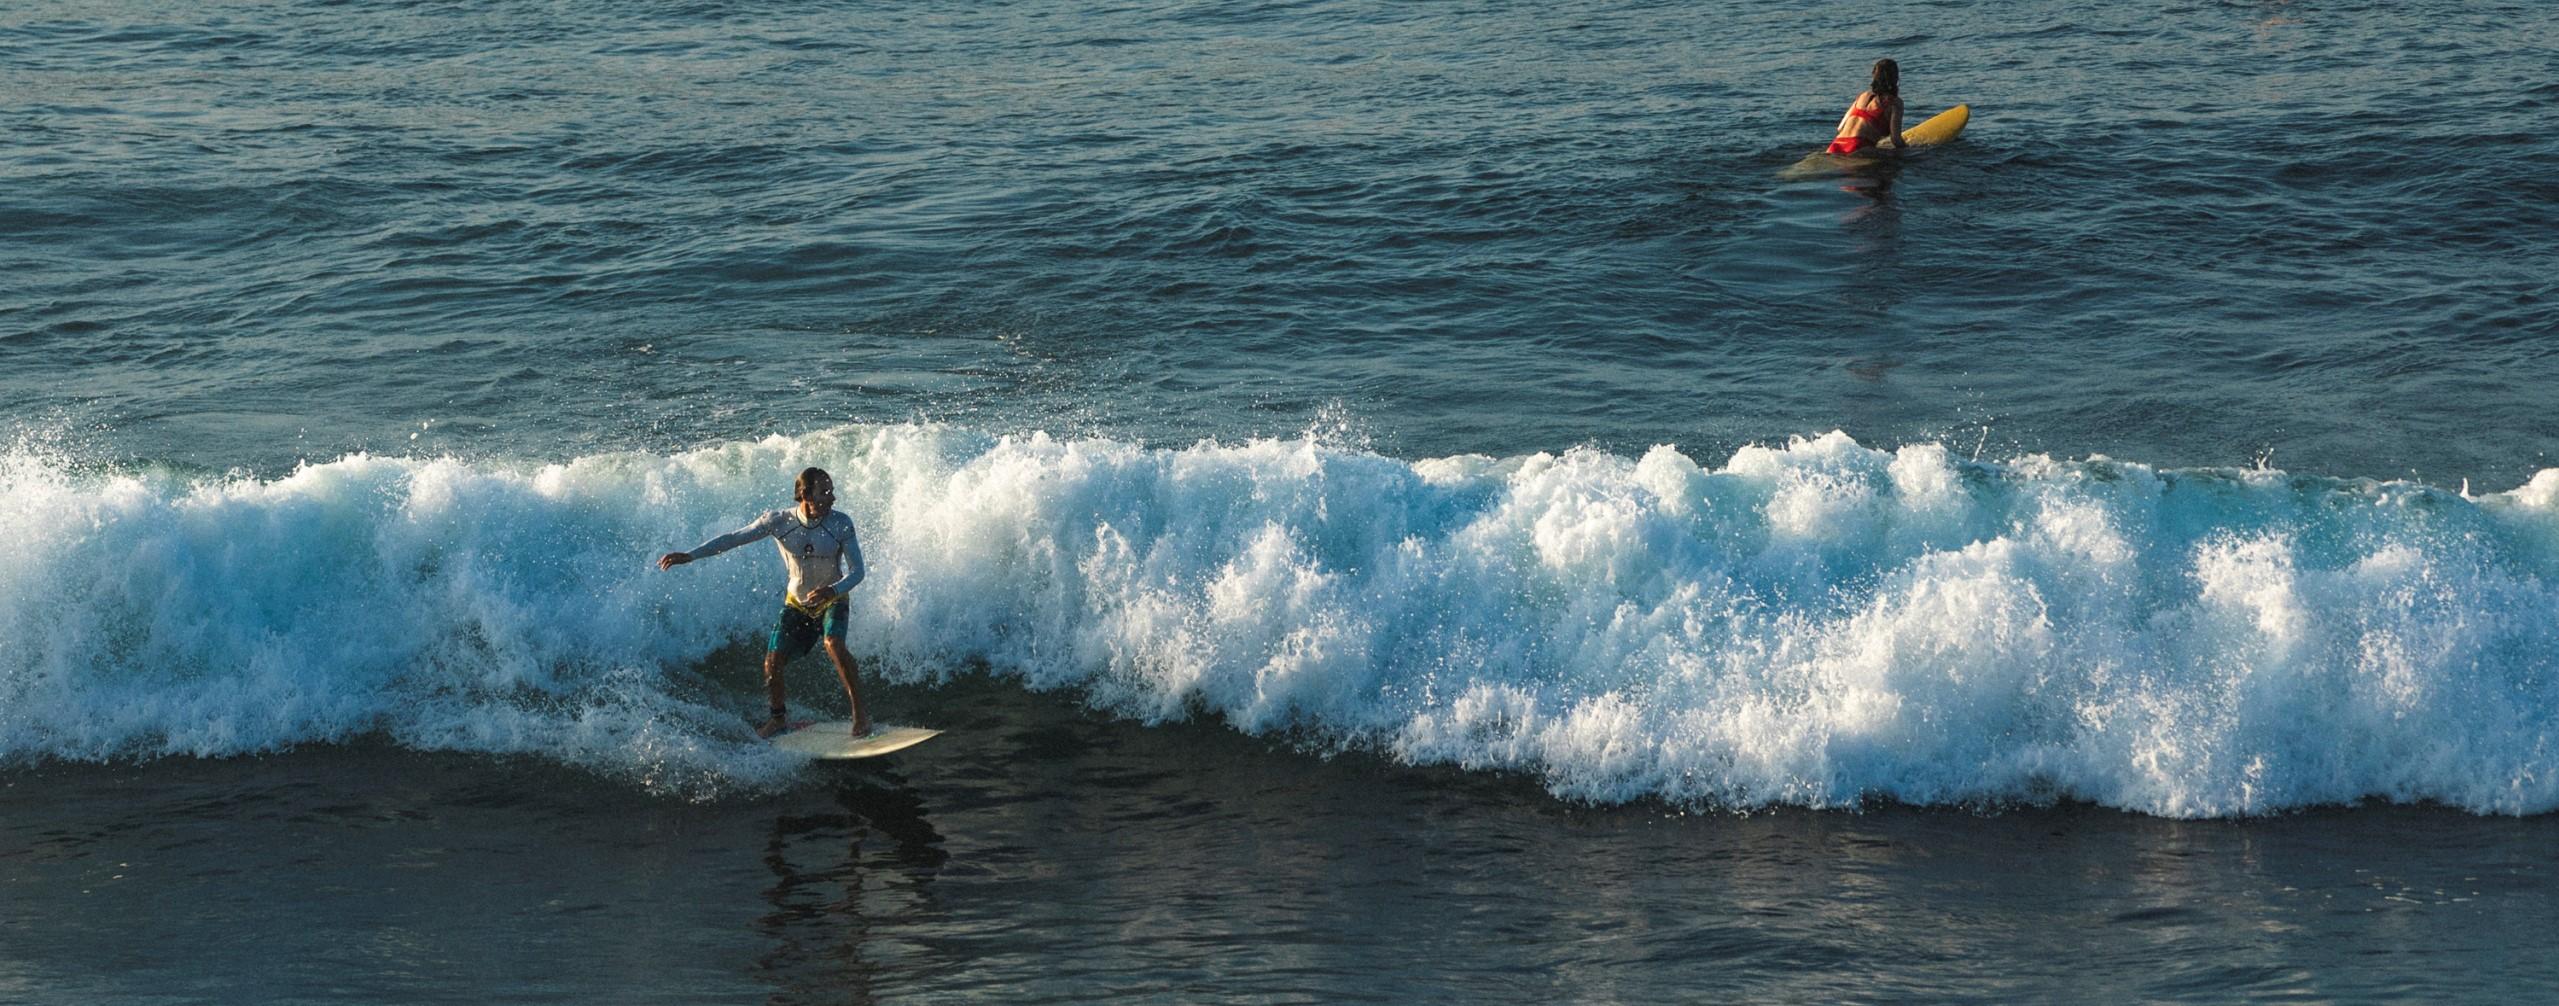 surfing-amanwella-beach-sri-lanka